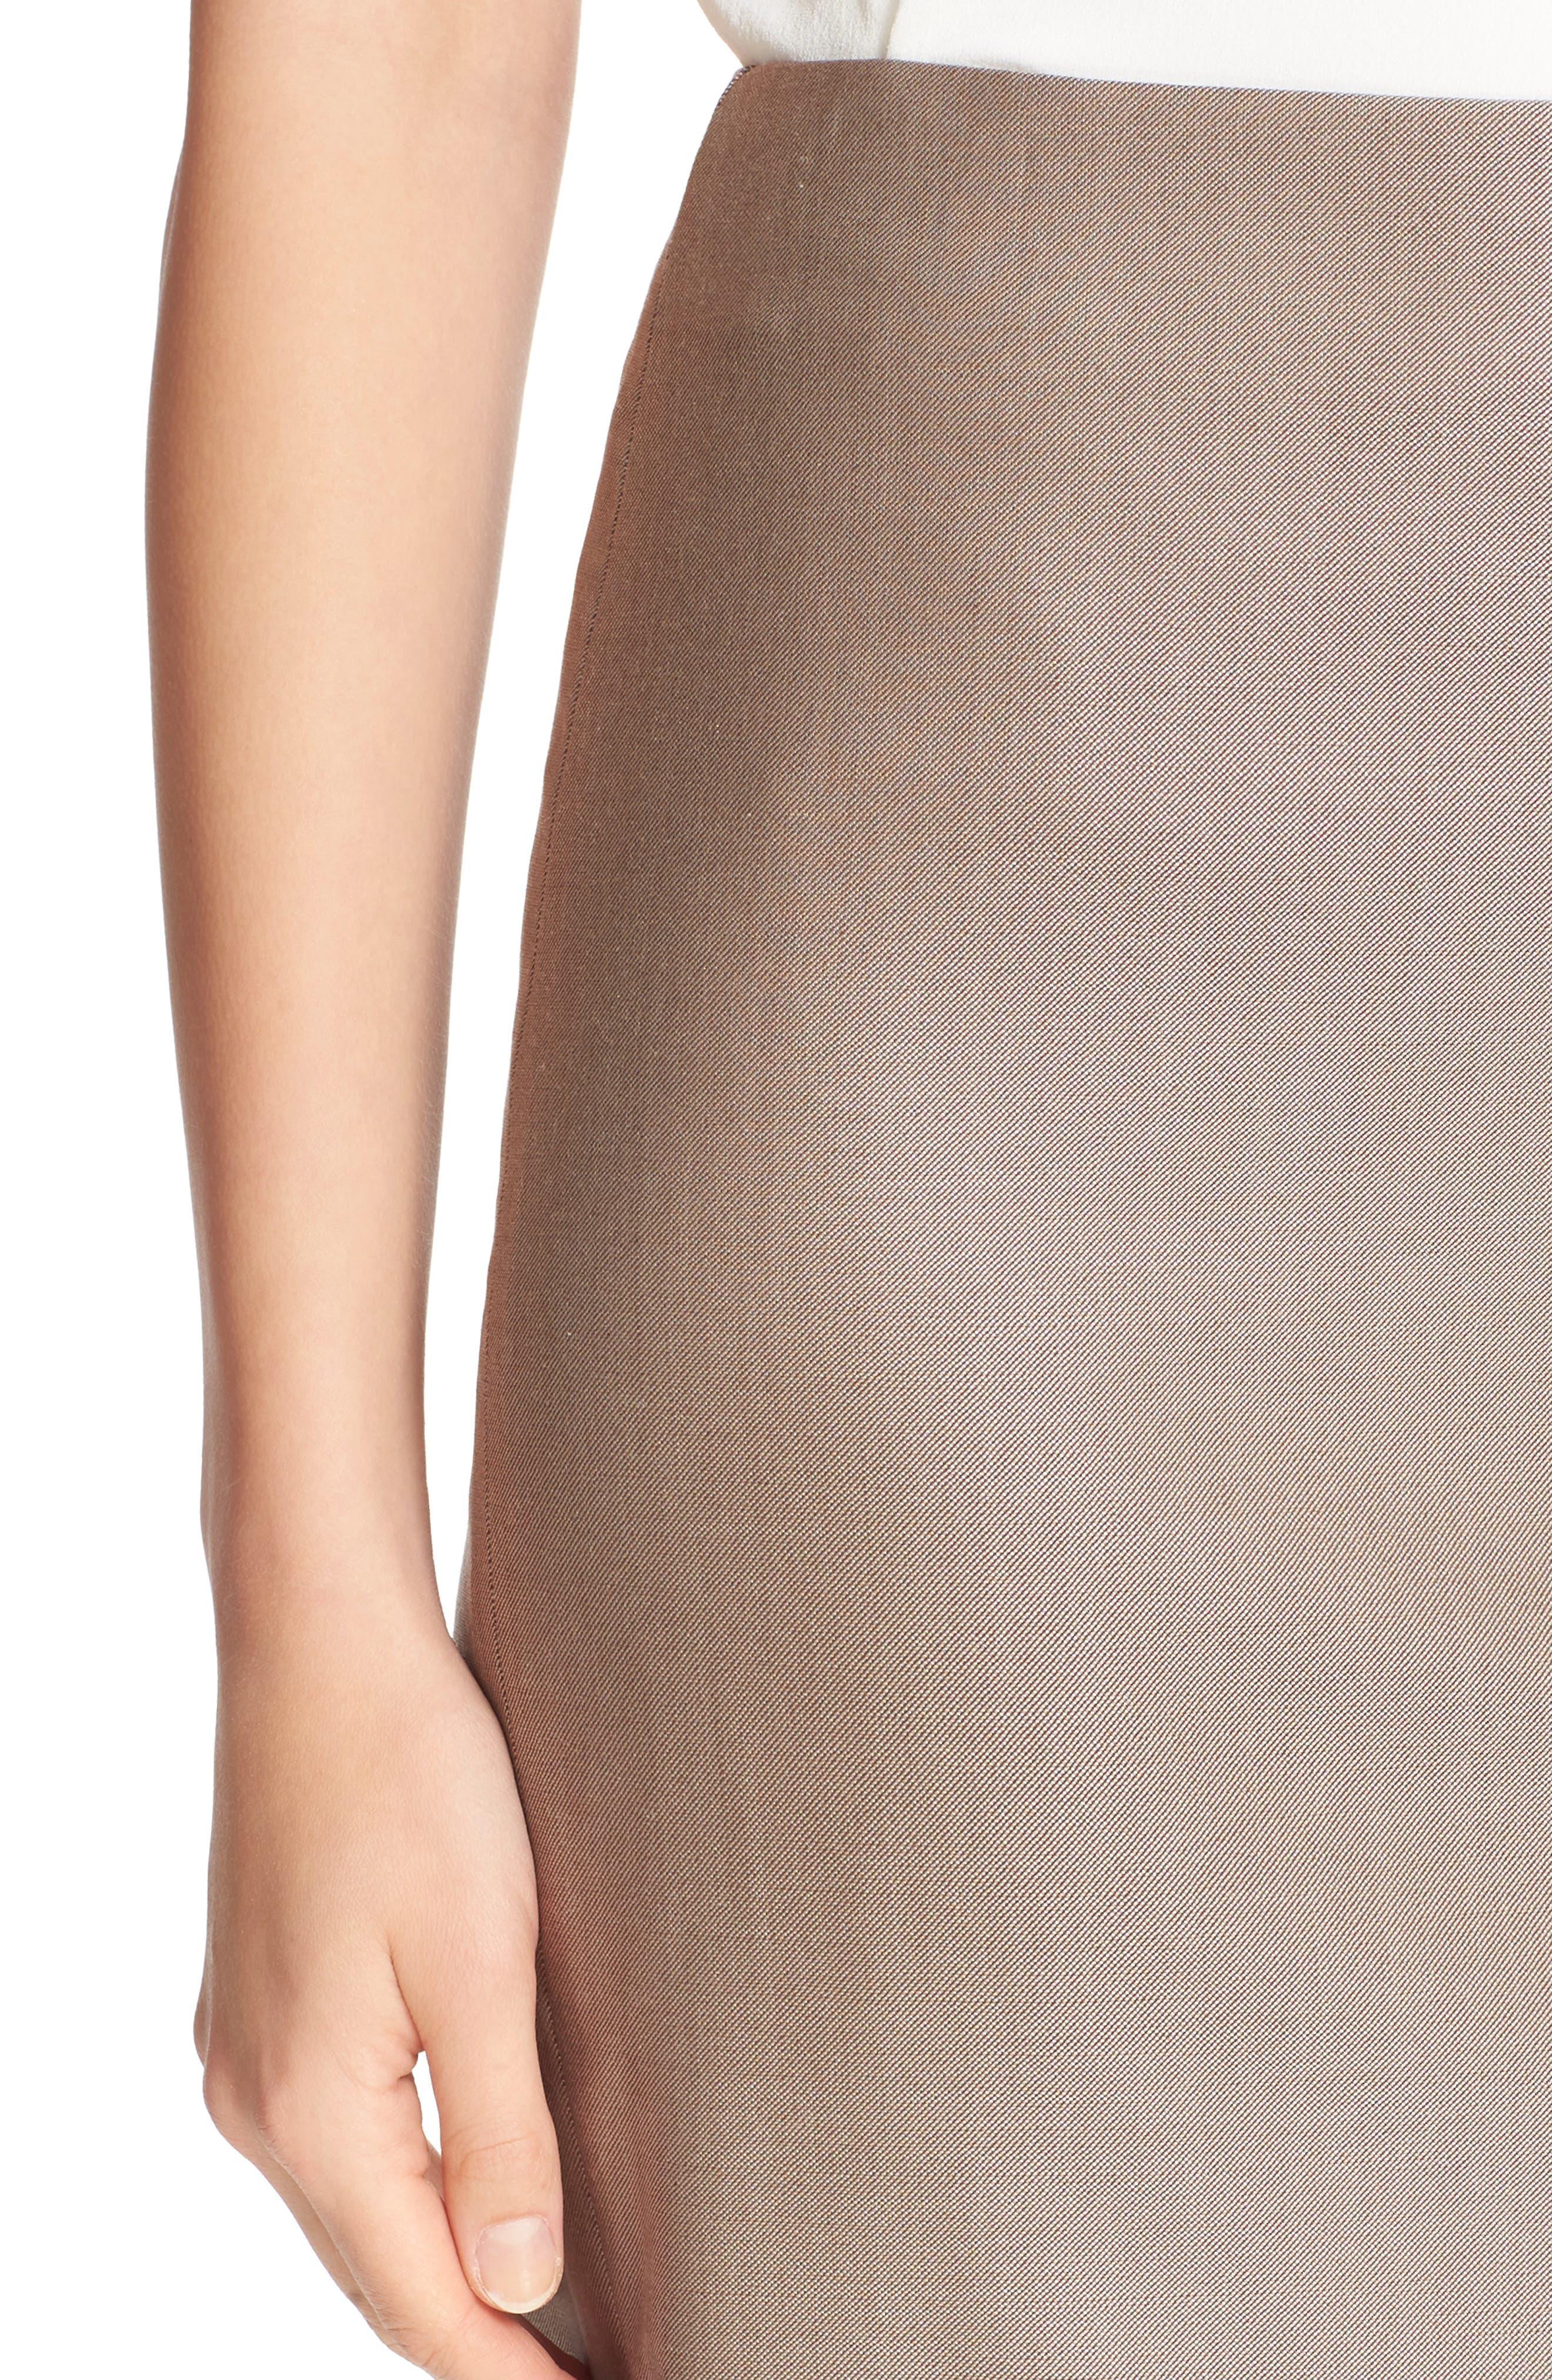 Wool Blend Pencil Skirt,                             Alternate thumbnail 5, color,                             220